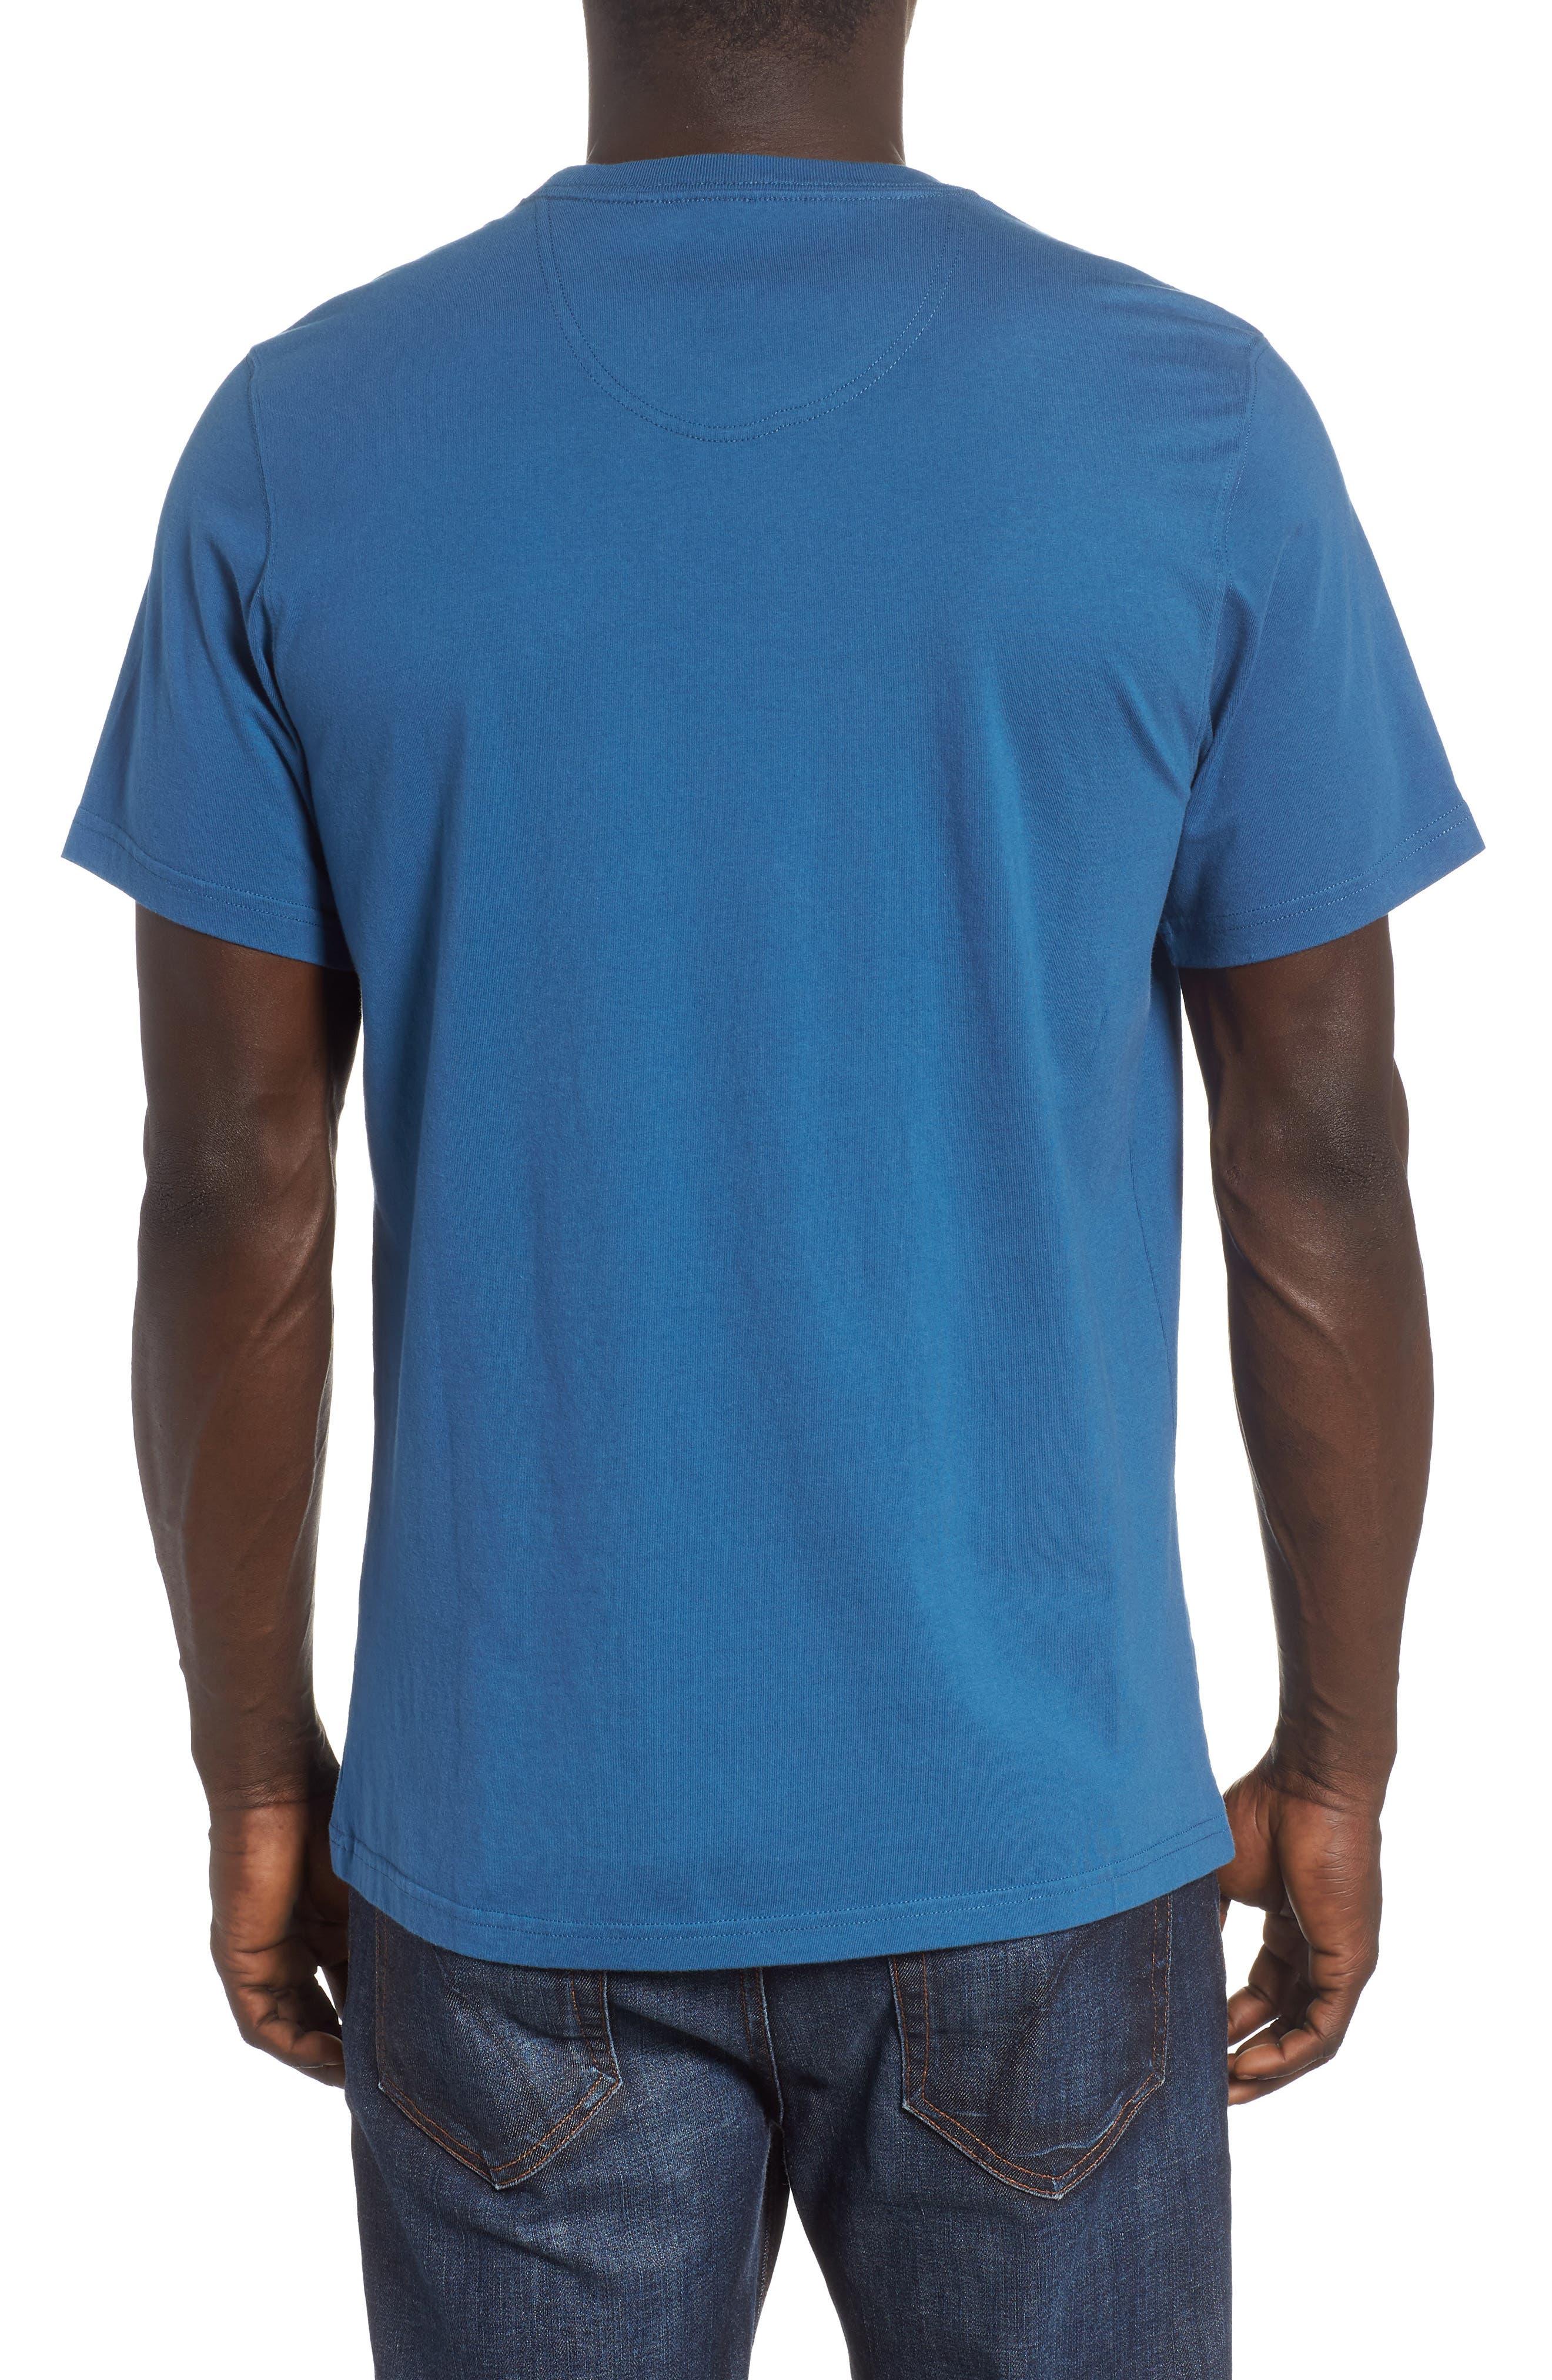 Waterline Graphic T-Shirt,                             Alternate thumbnail 2, color,                             Sea Blue